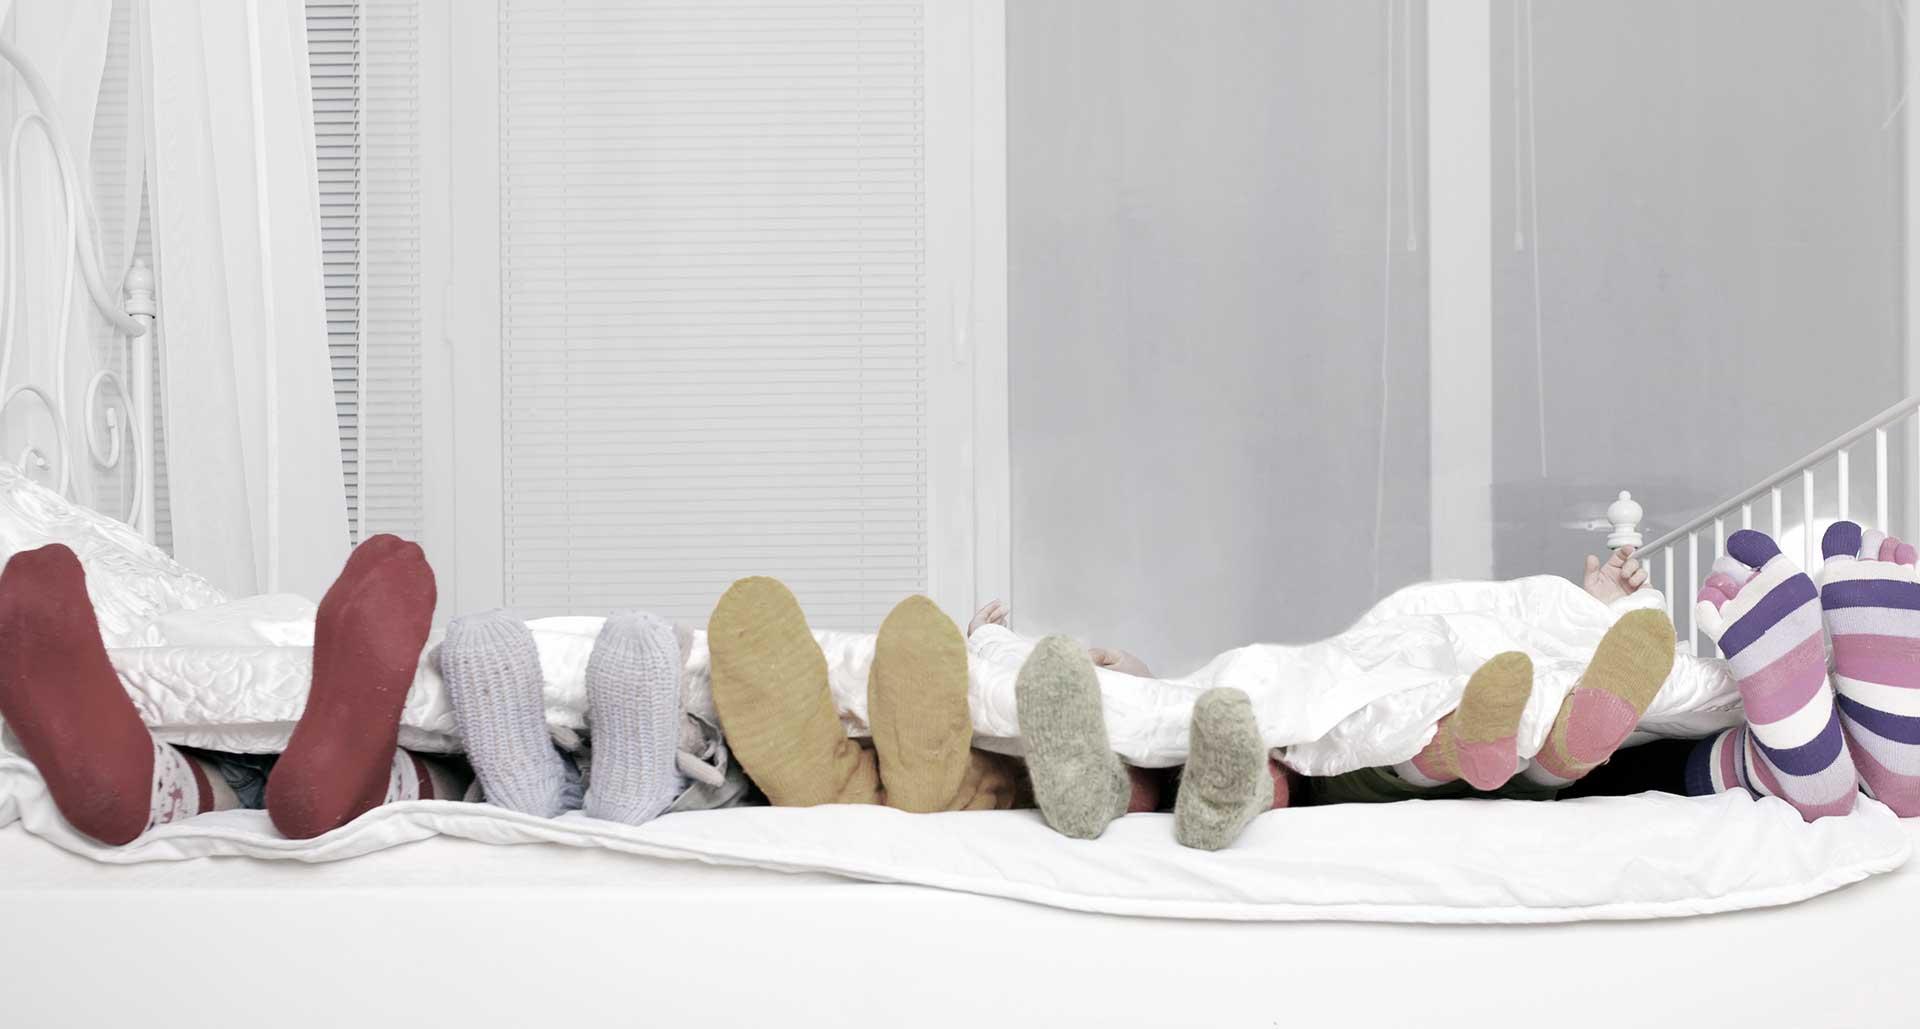 familie_med_stroemper_i_sengen